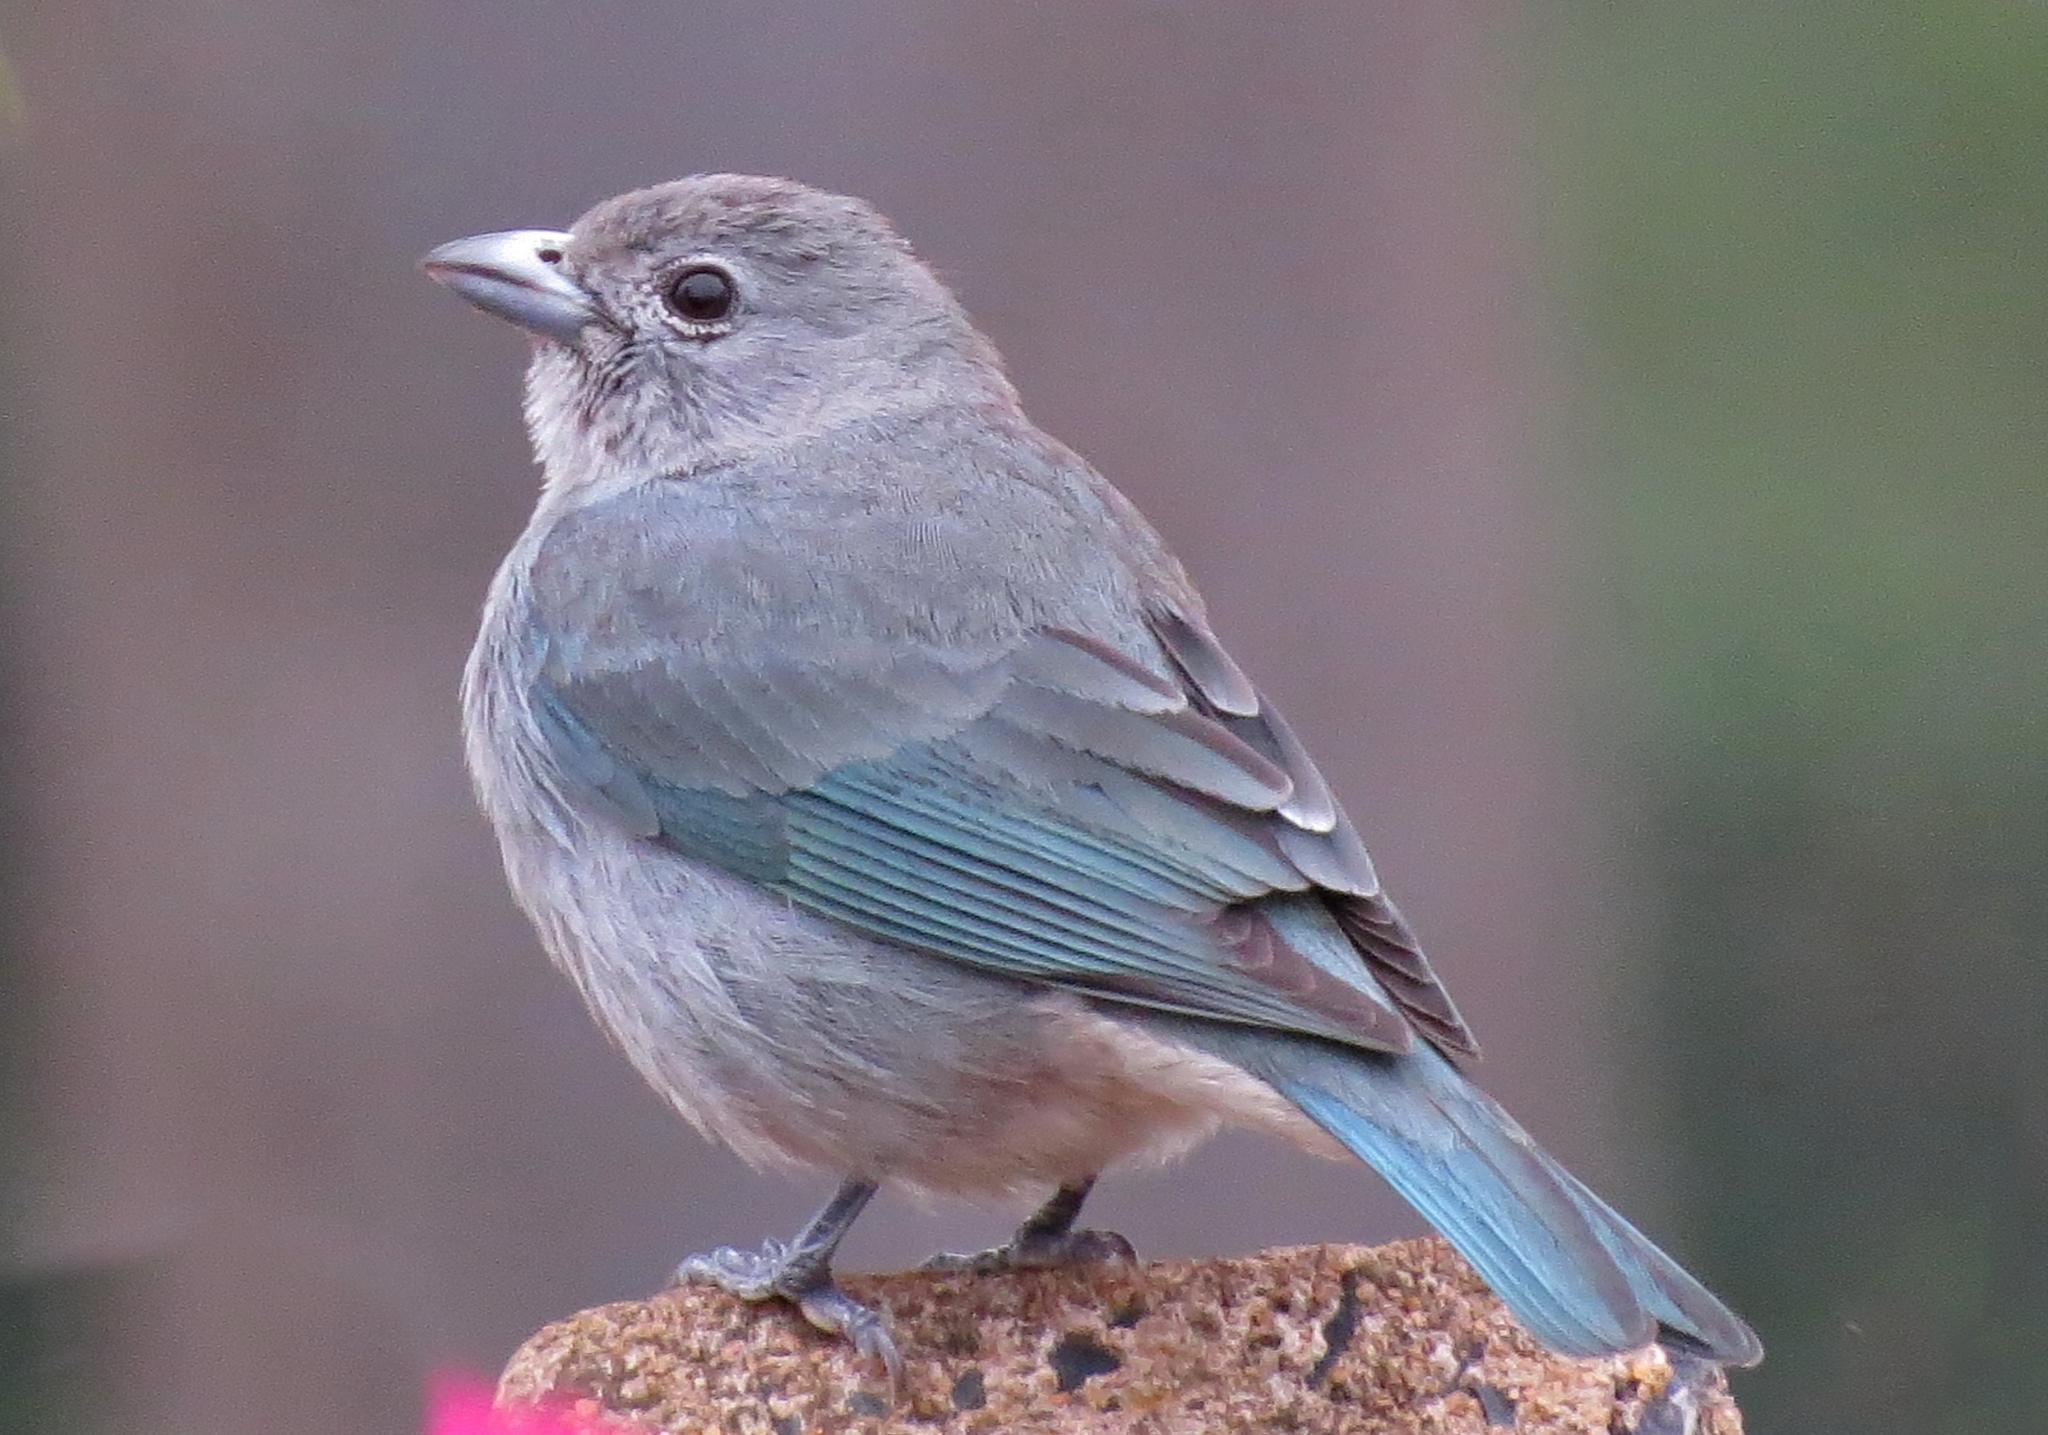 Blue bird by Nestor